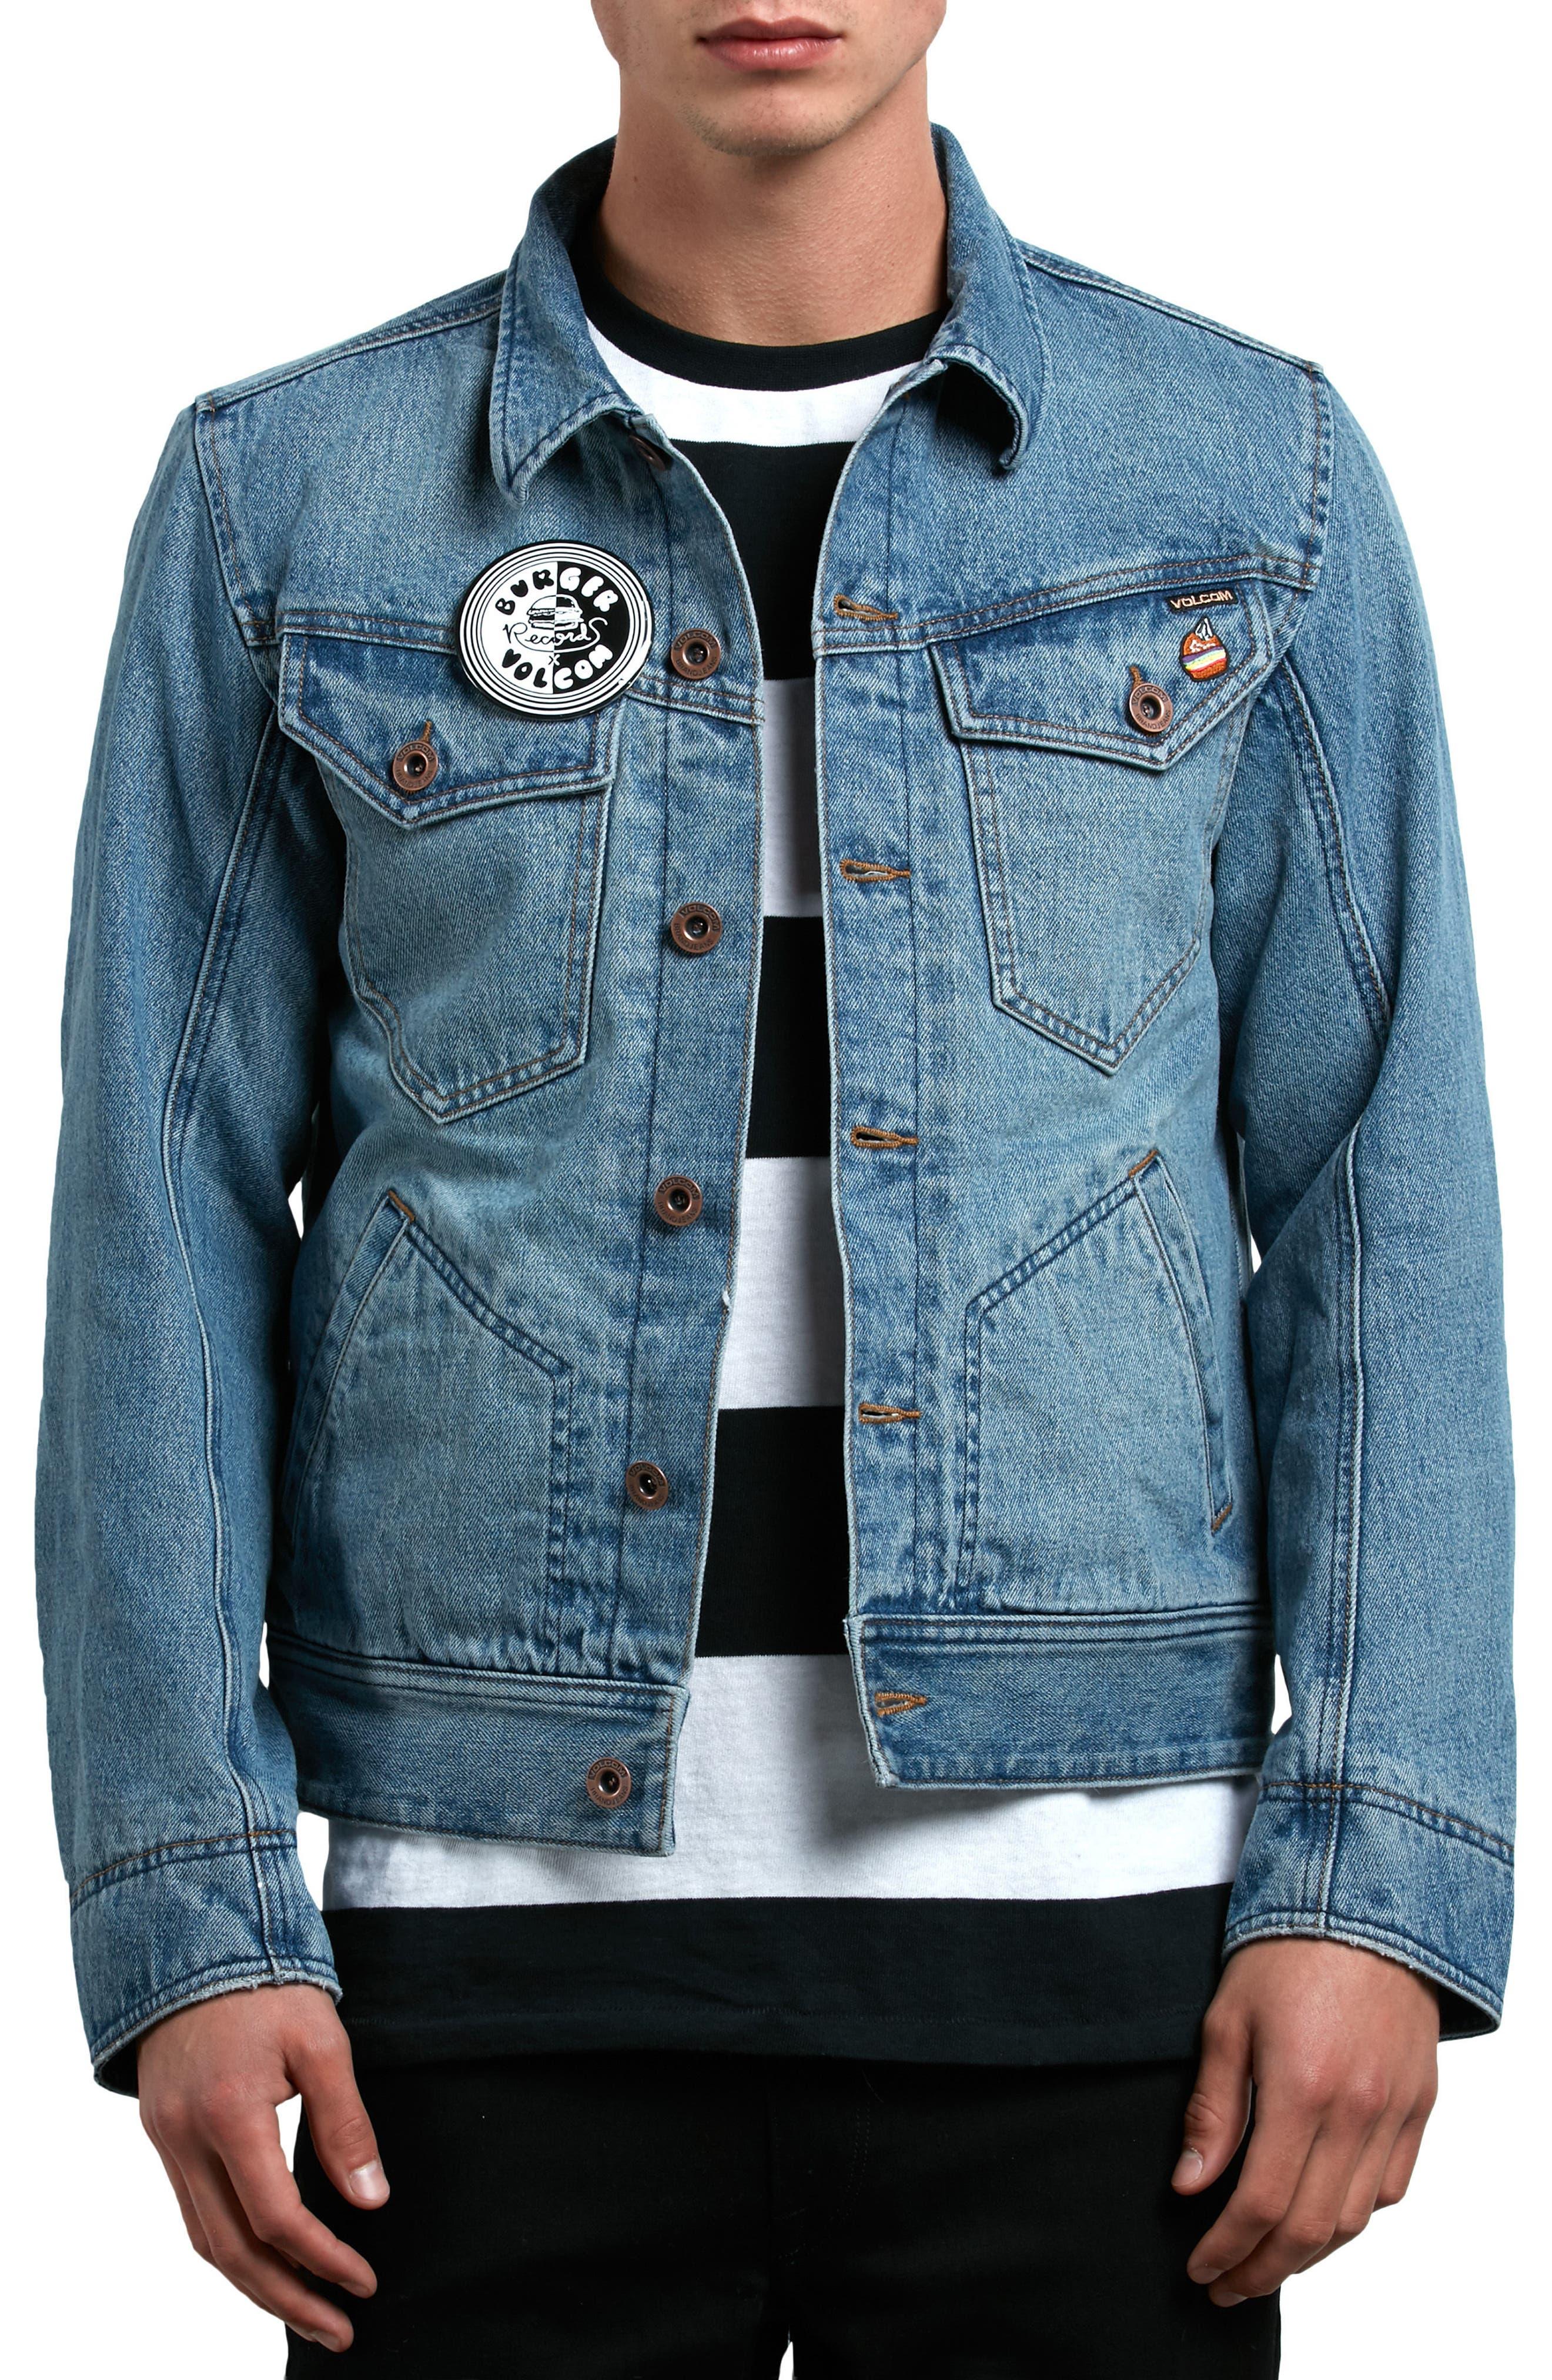 Main Image - Volcom x Burger Records Denim Jacket